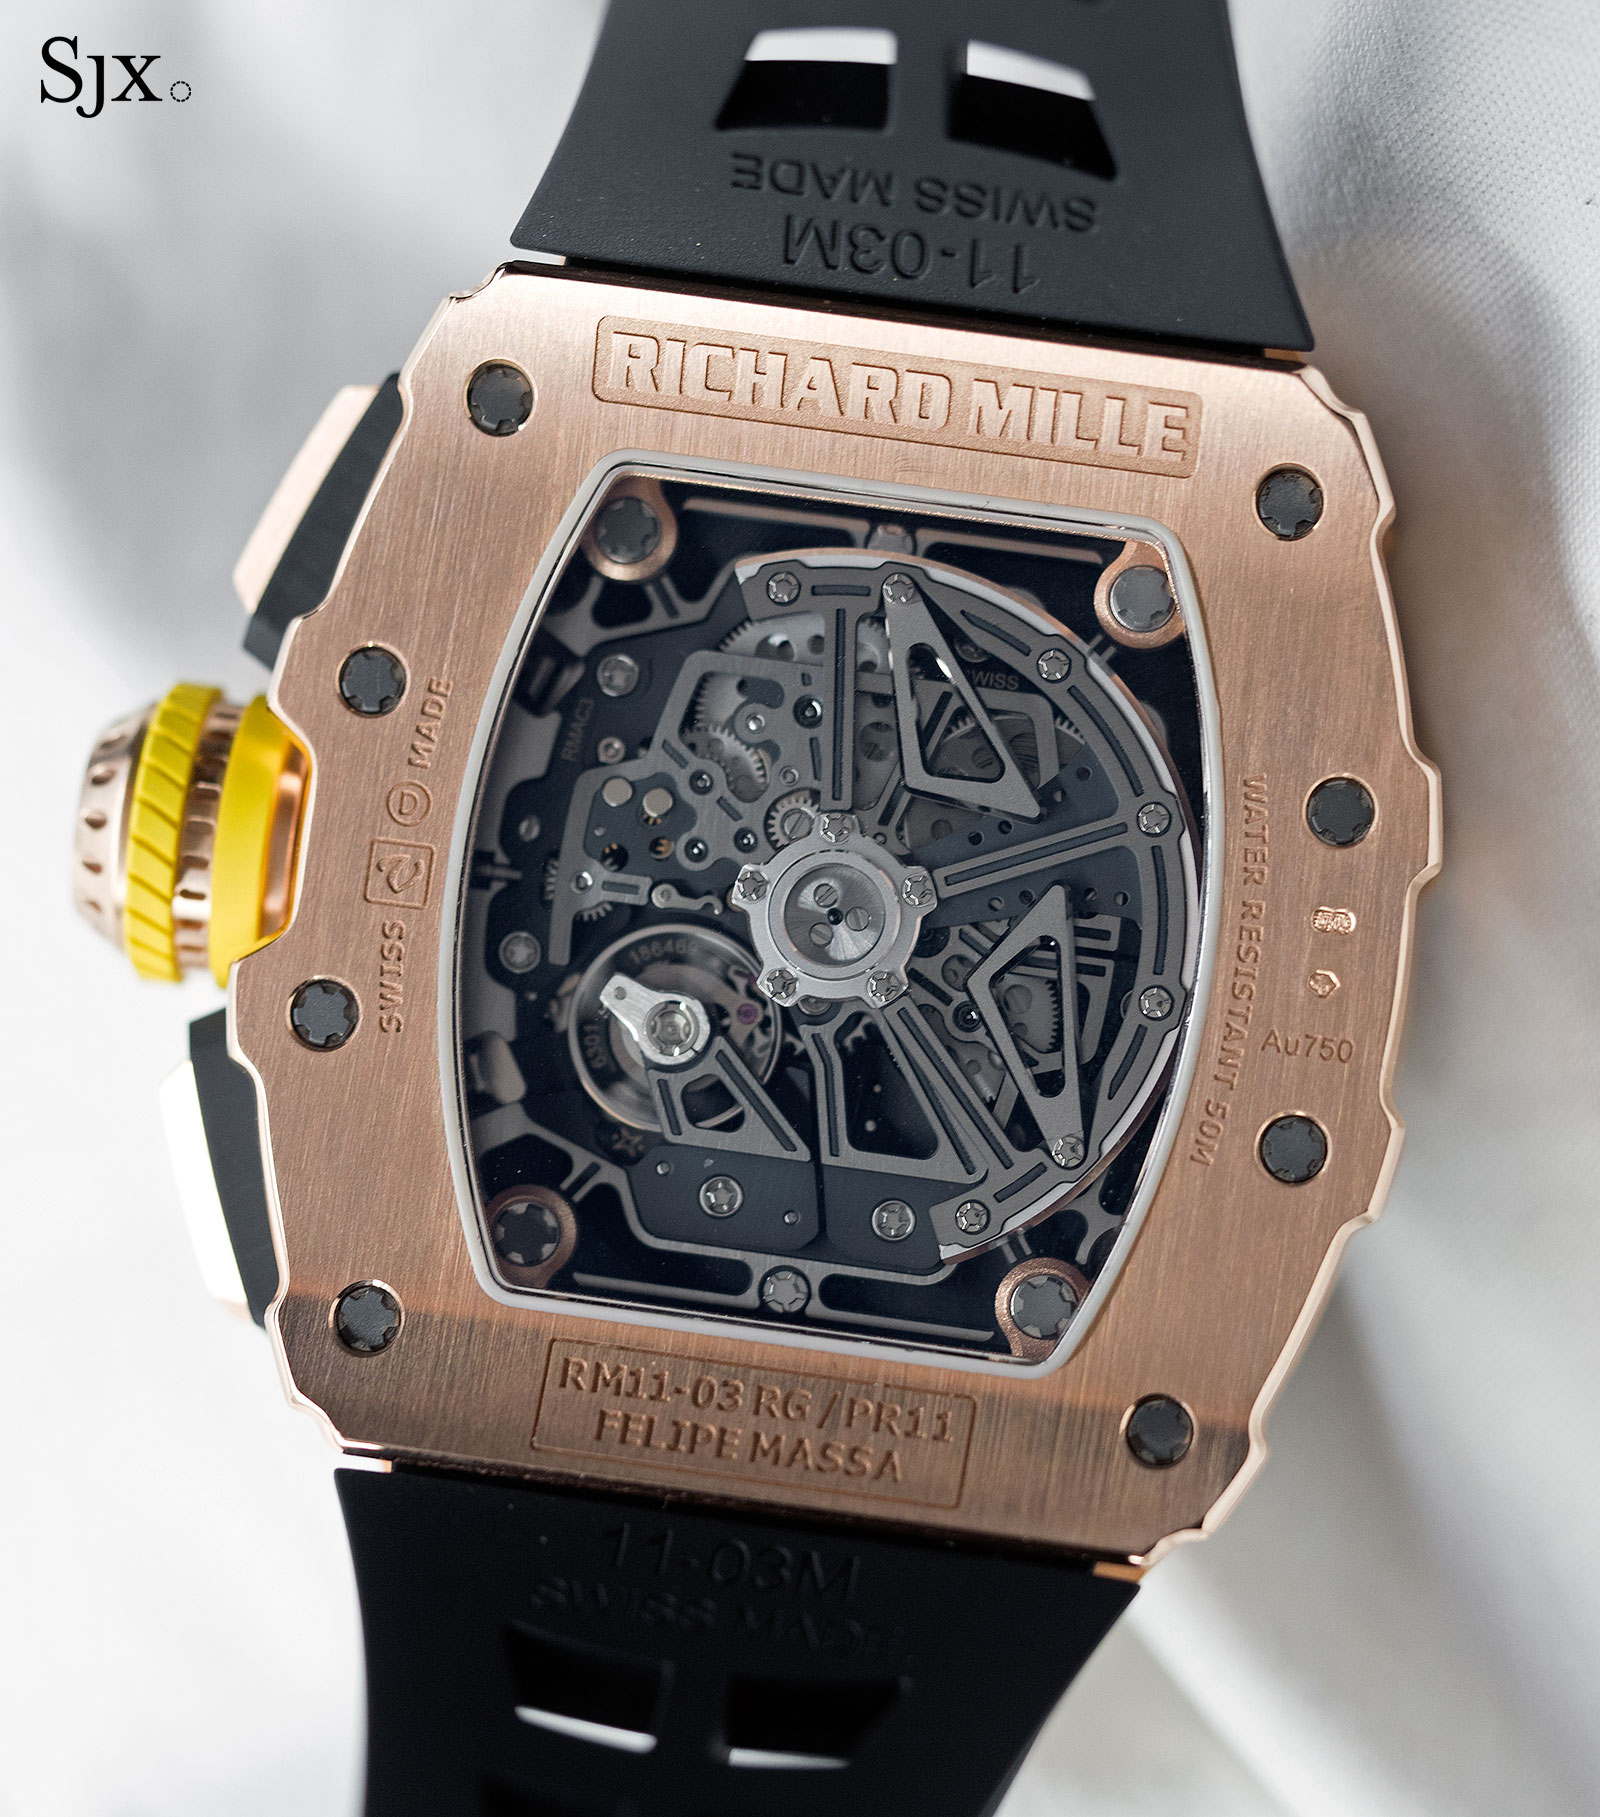 Richard Mille RM 11-03 RG-5